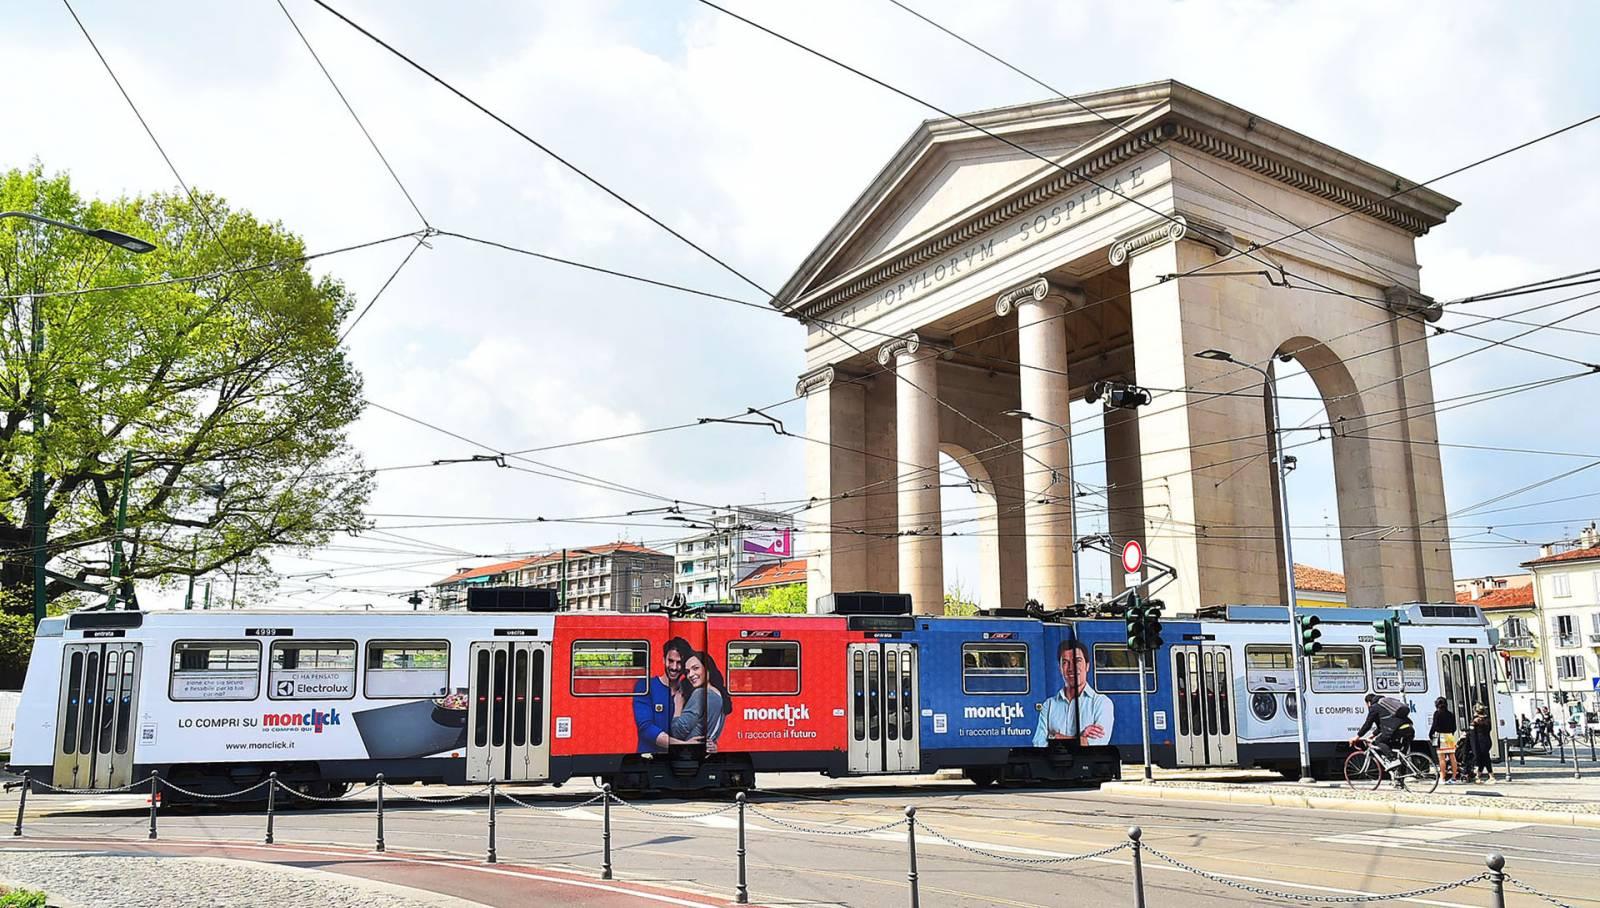 Pubblicità sui tram IGPDecaux Milano Full-Wrap per Monclick